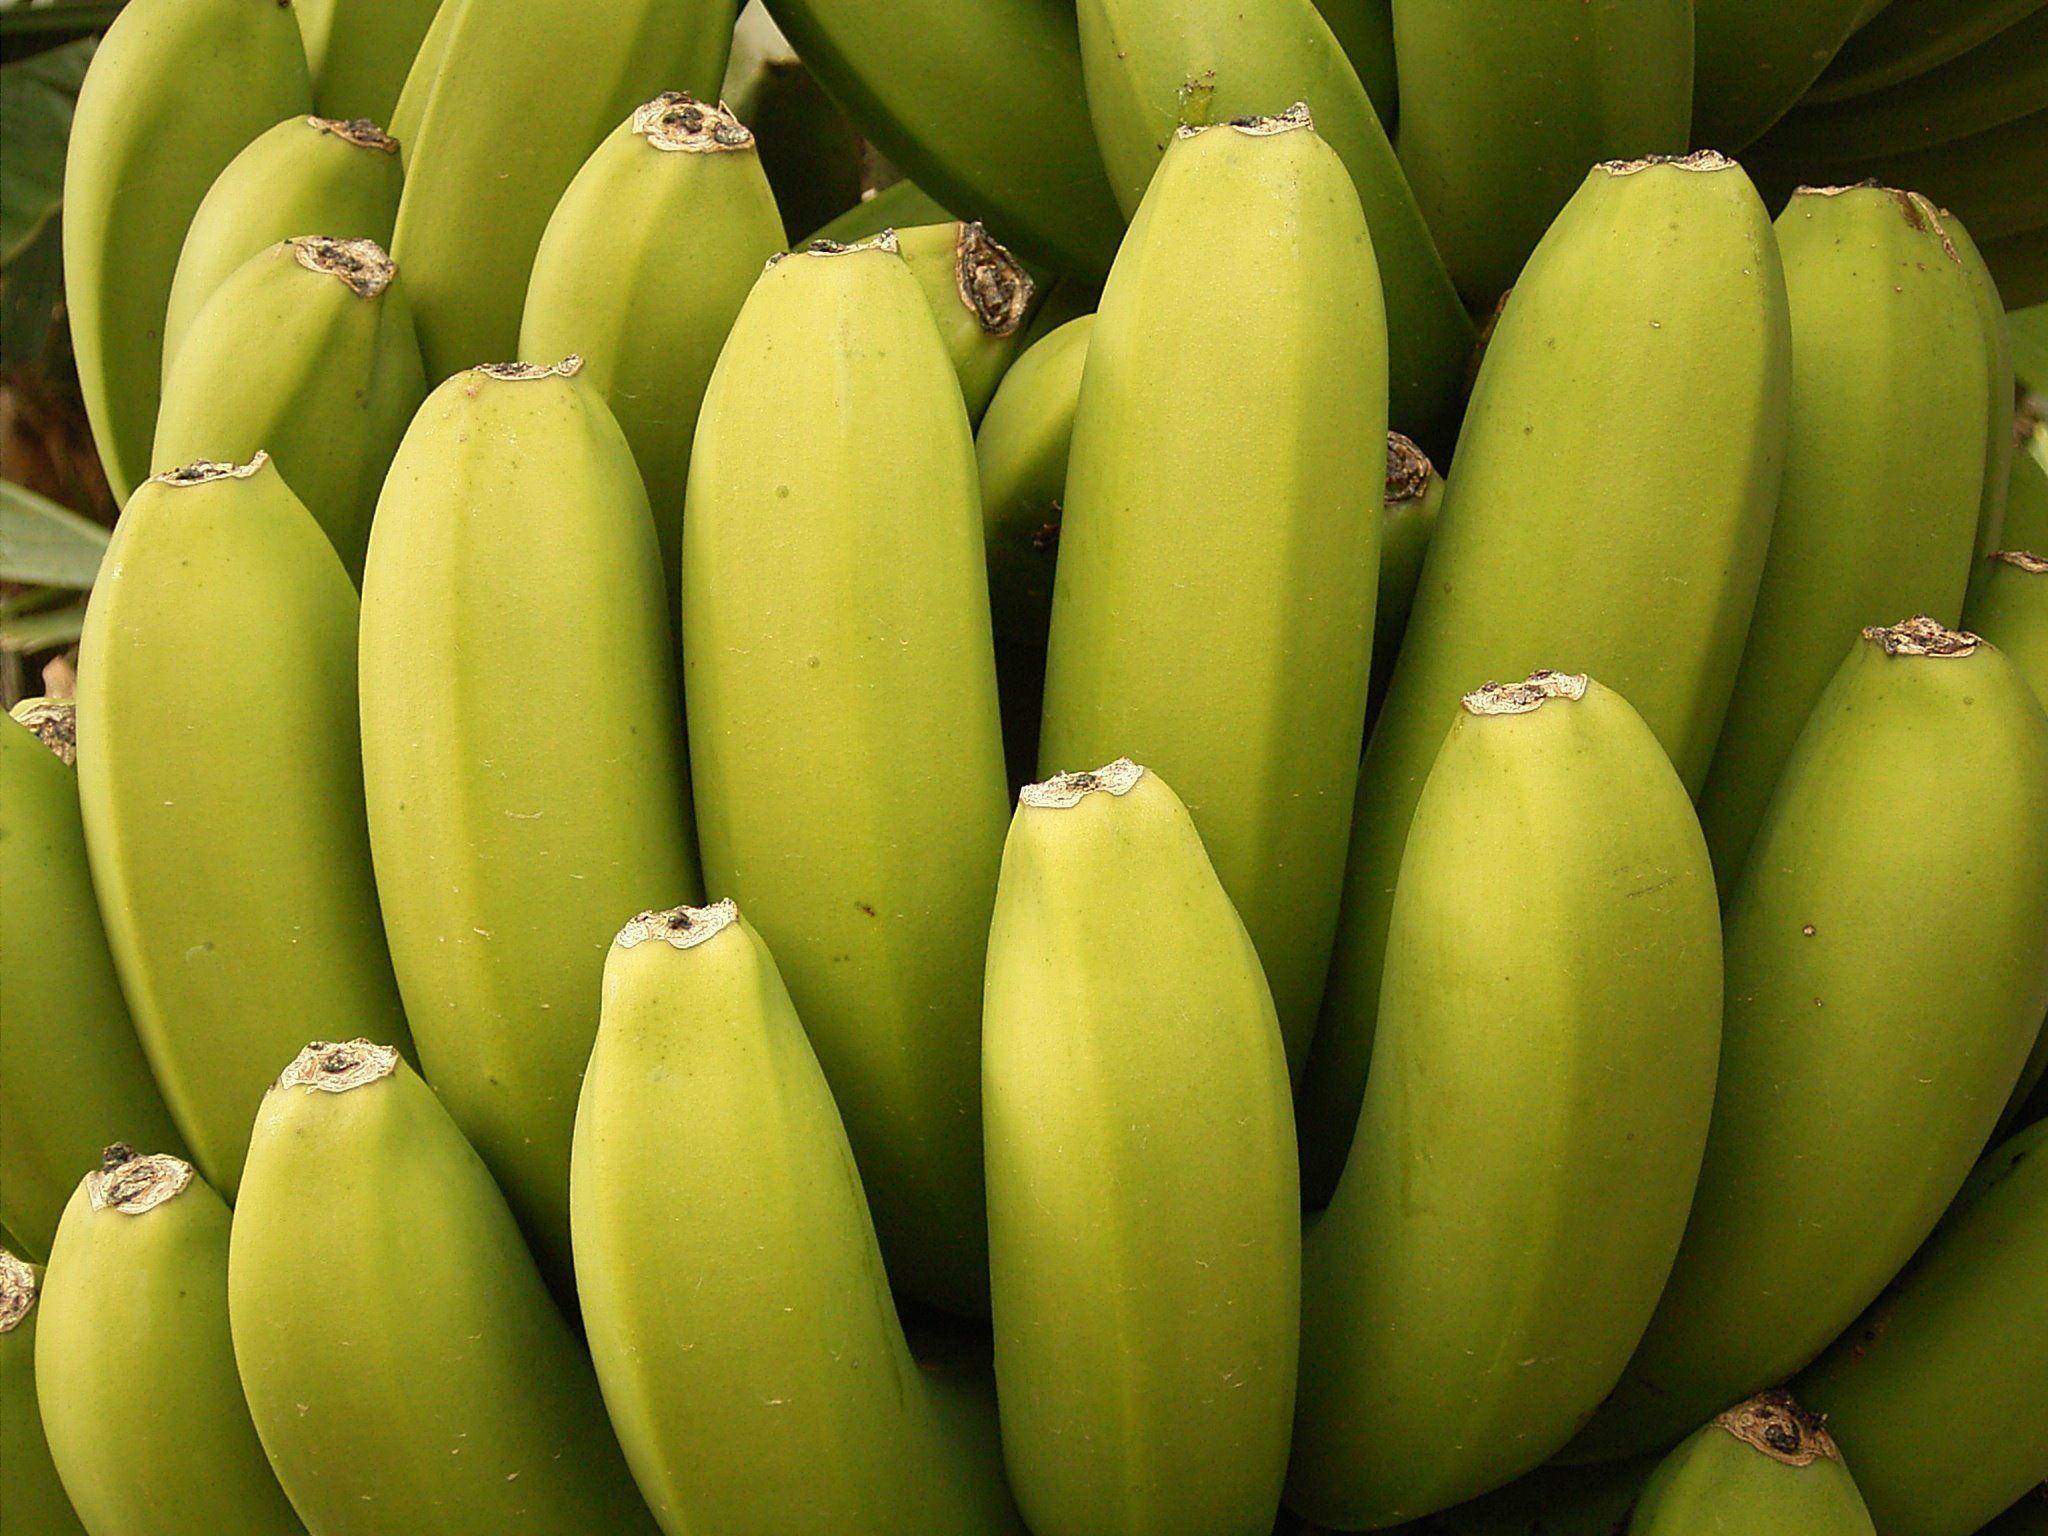 banana hd desktop wallpapers | wallpapers | pinterest | bananas and